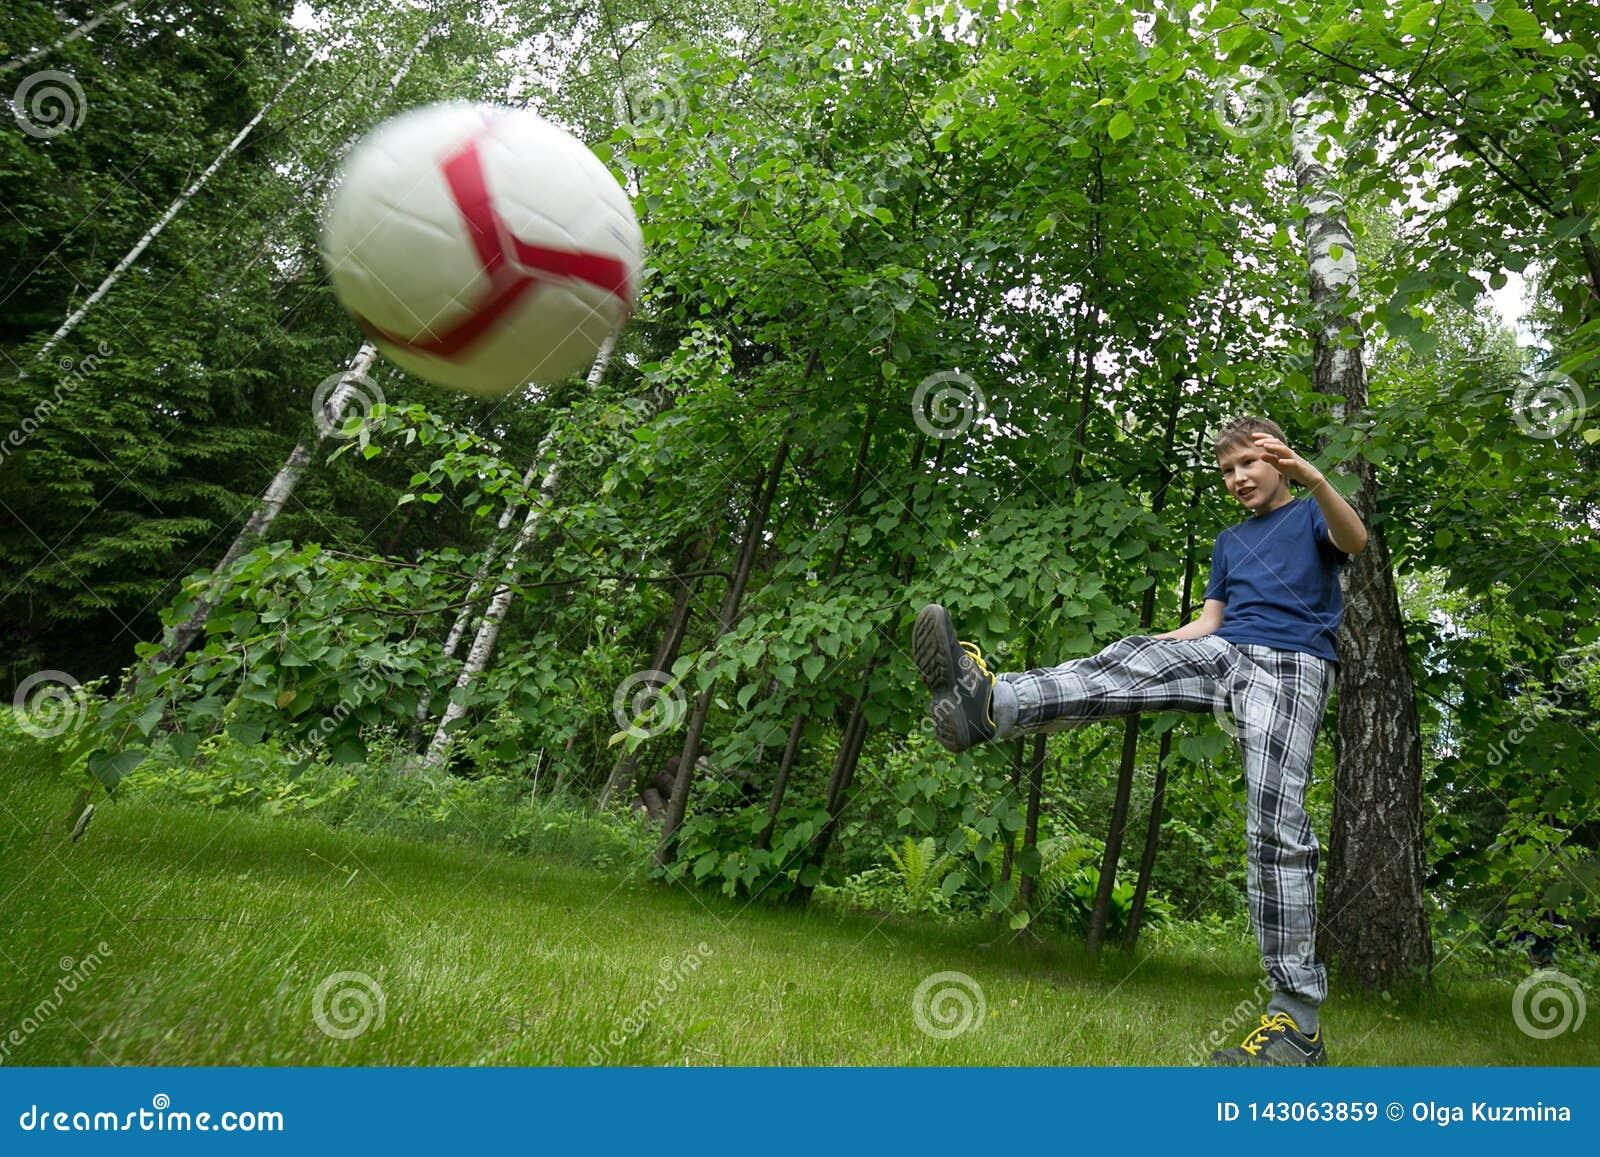 A boy of European appearance plays football. Bright emotion, flying ball